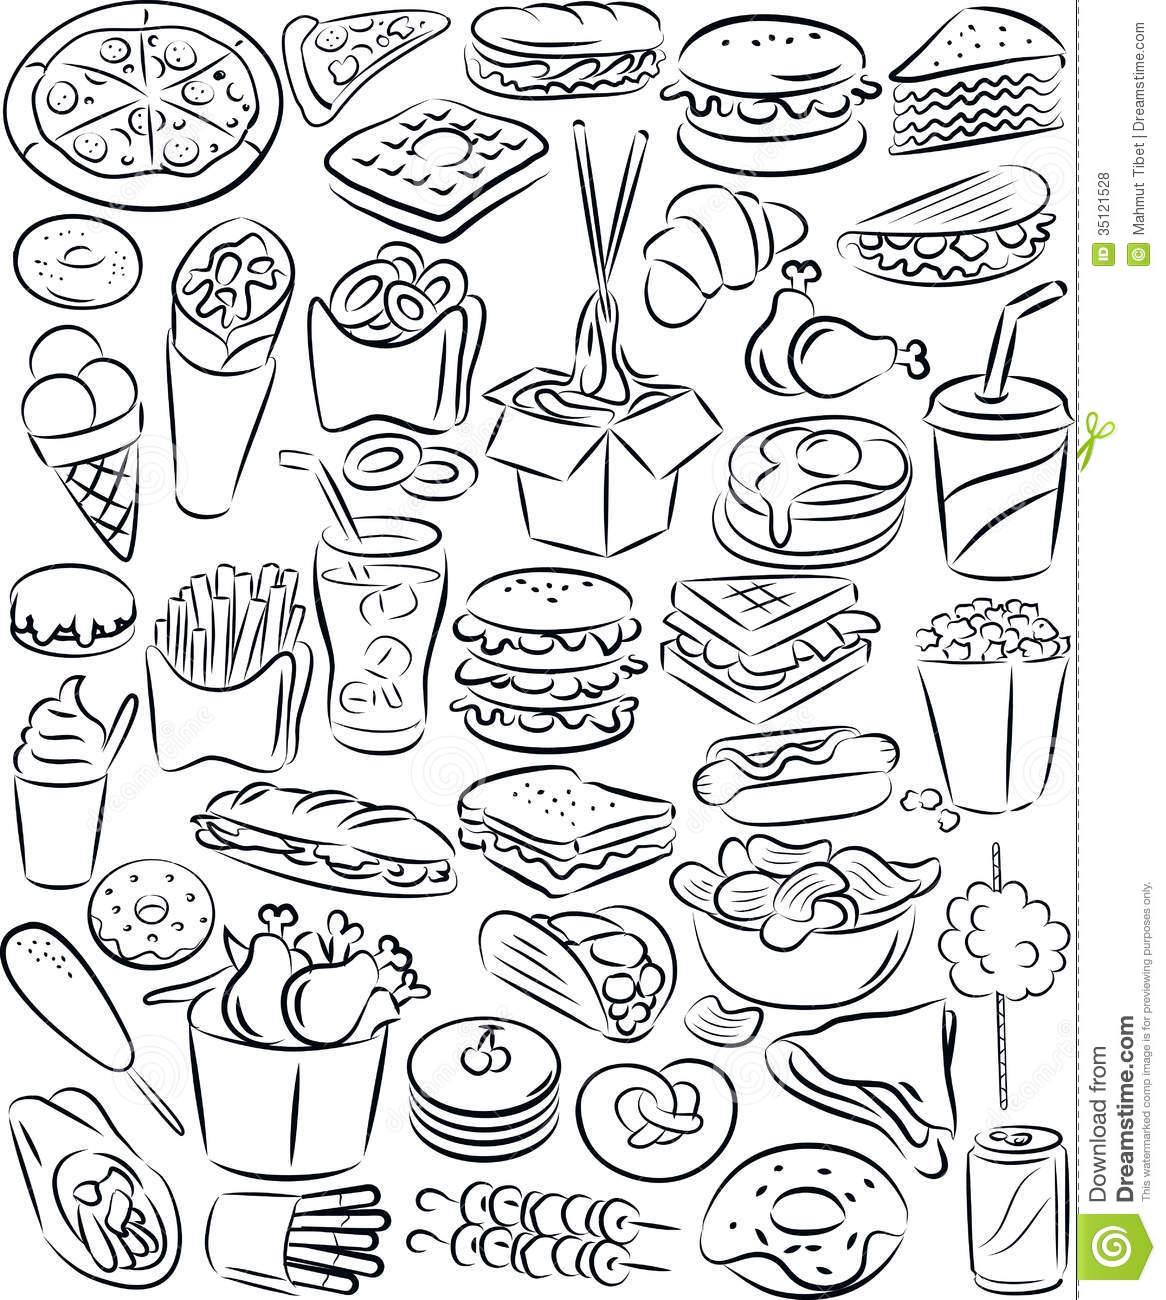 Fast food set stock vector. Illustration of pretzel, food.